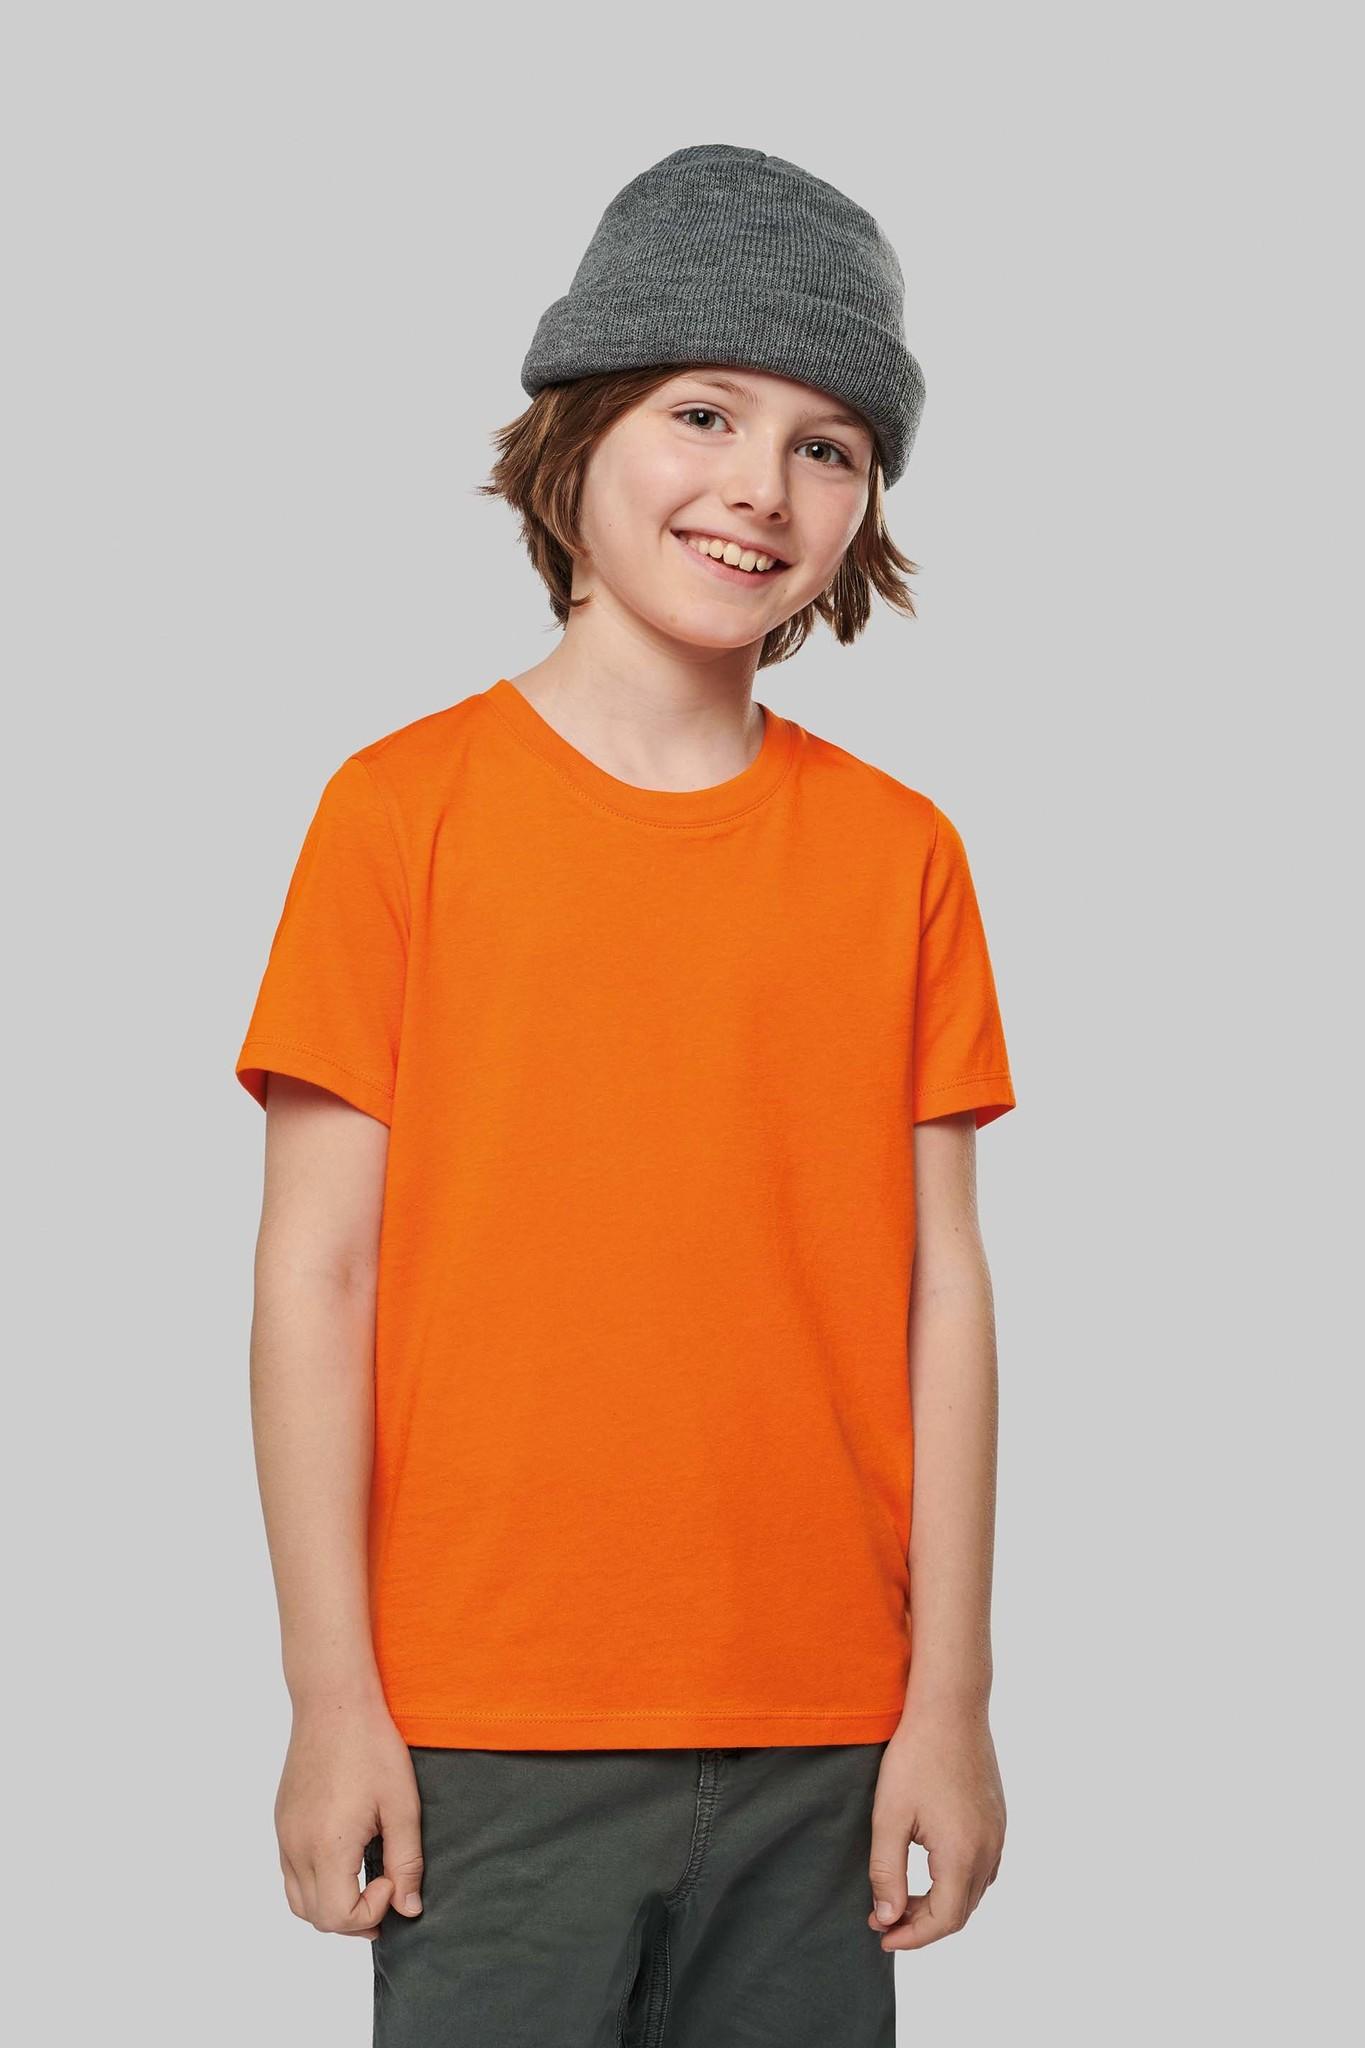 Eco-Friendly KIDS T-shirt - Black